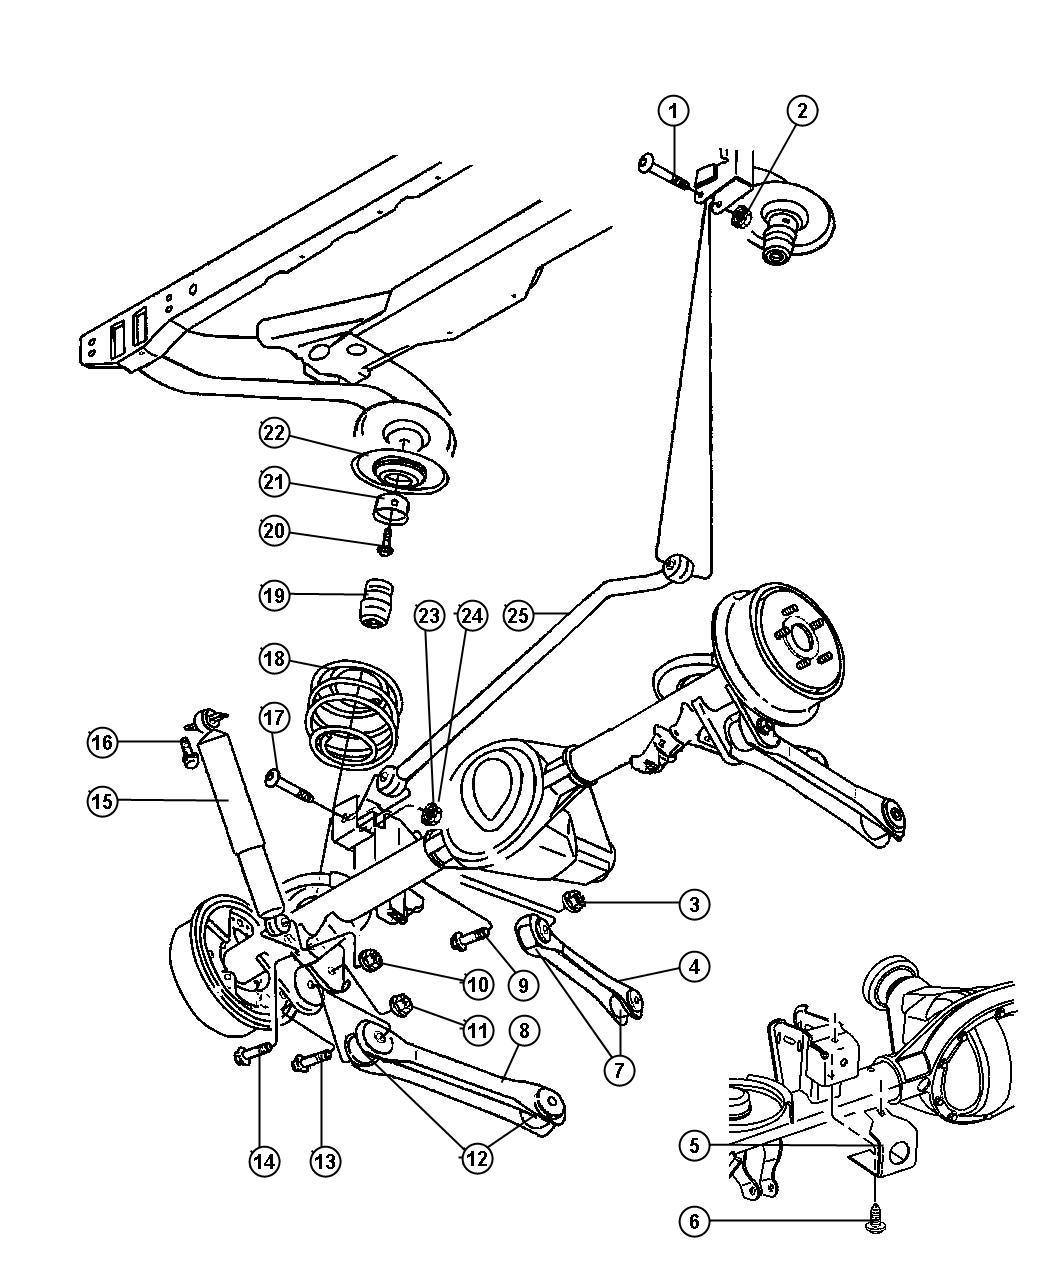 2006 Jeep Wrangler Shock absorber. Suspension. Rear